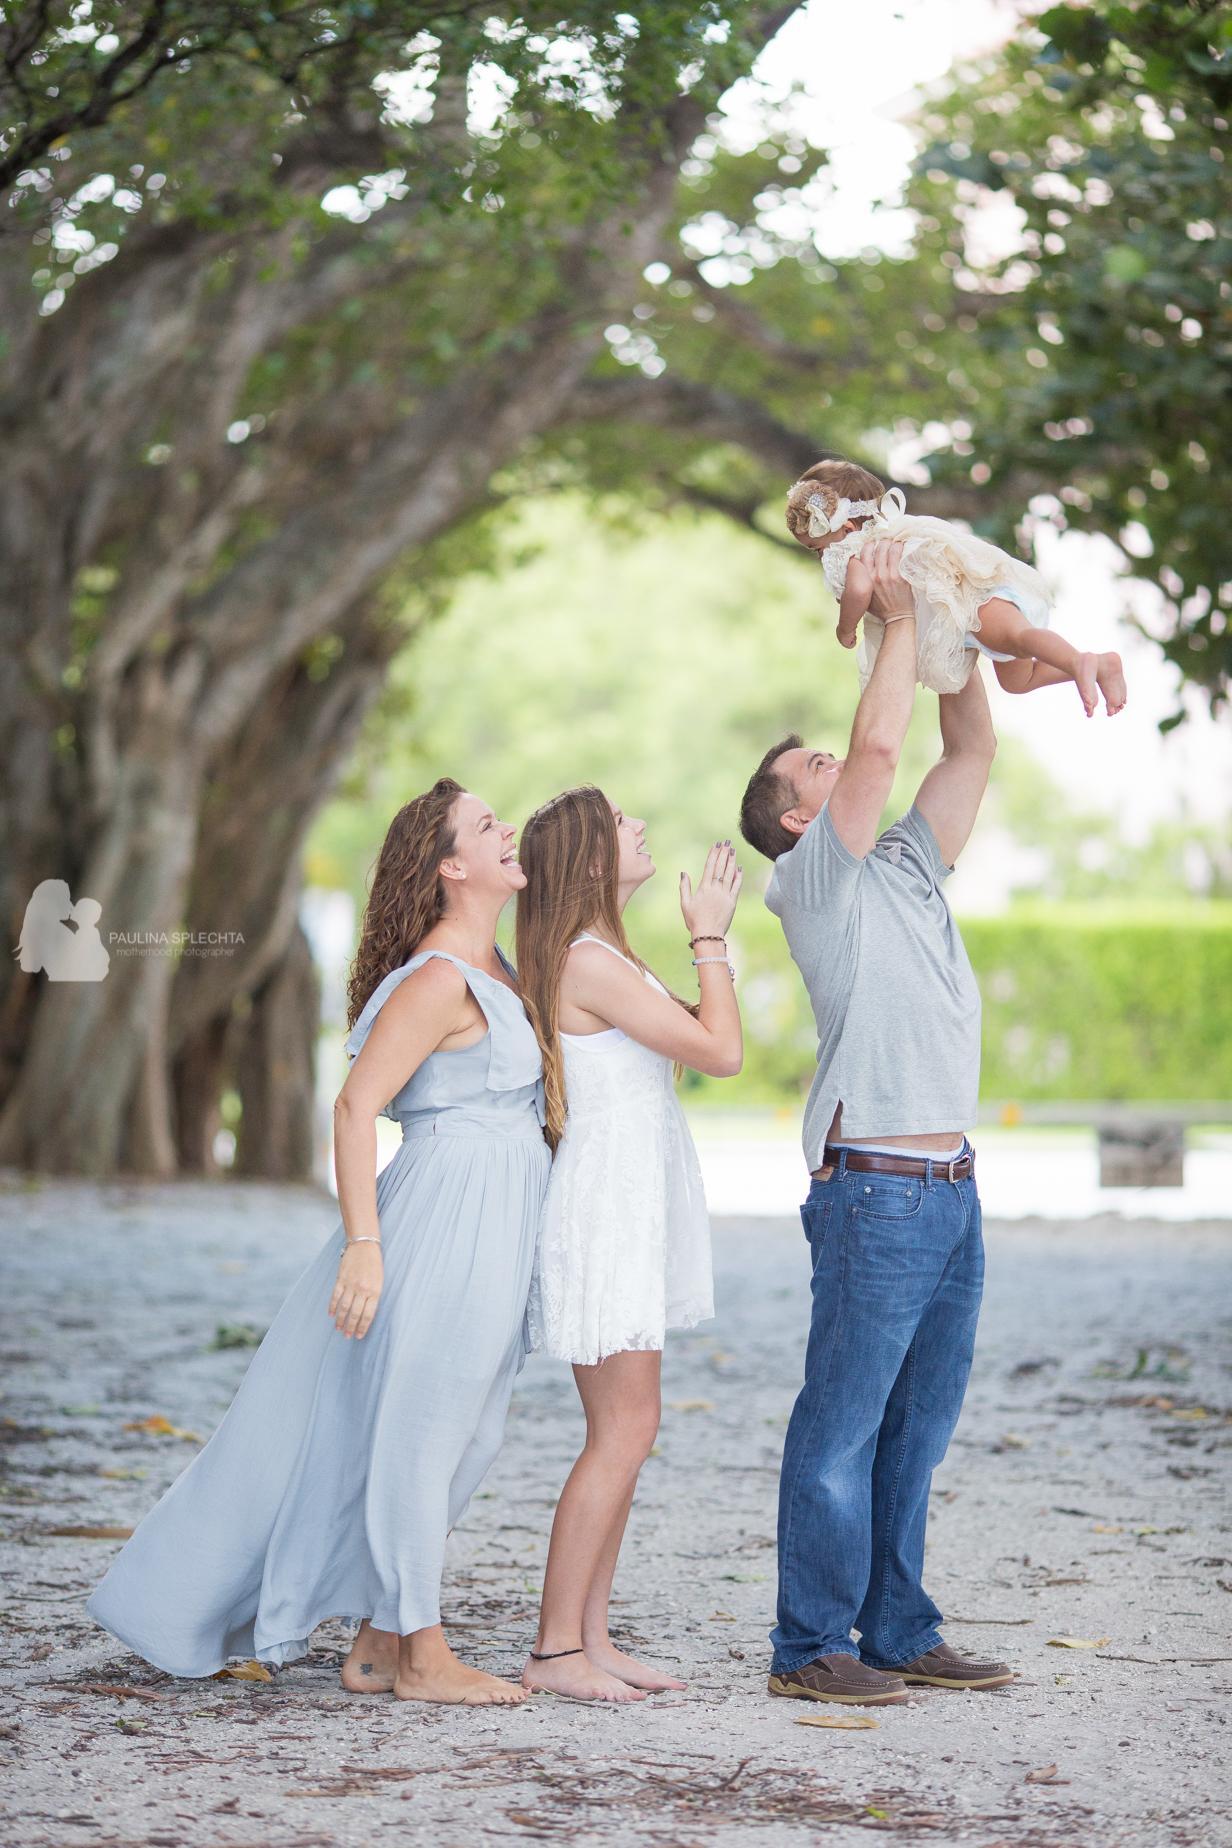 birth-photographer-breastfeeding-family-child-newborn-cake-smash-pregnancy-maternity-1.jpg